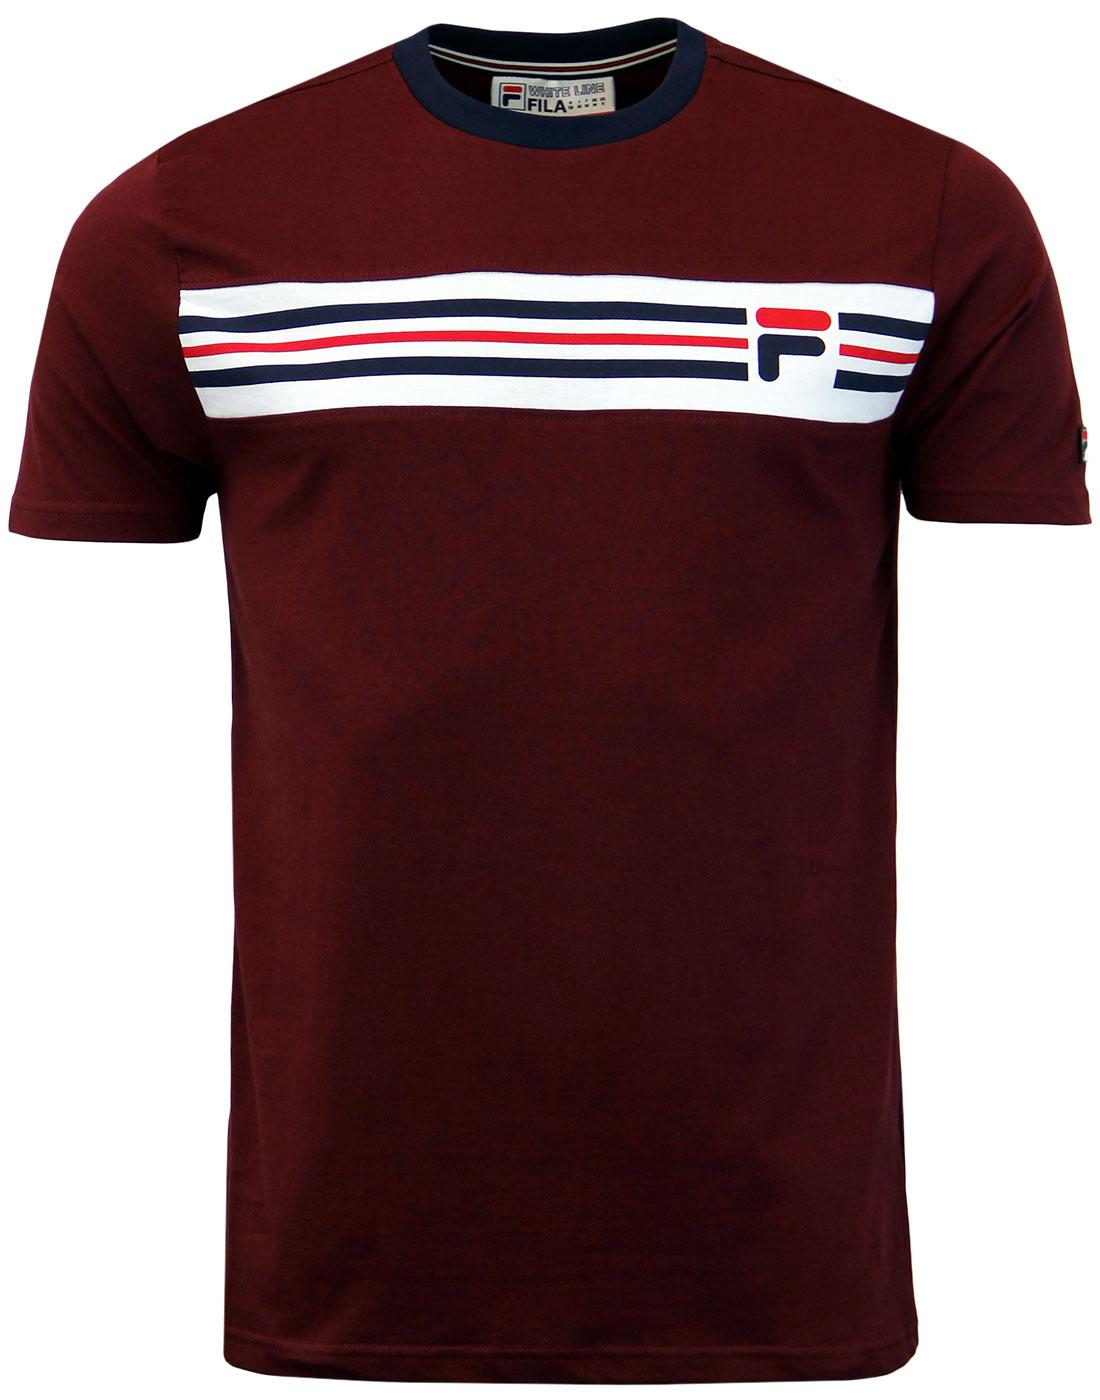 Vandorno FILA VINTAGE Retro 70s T-Shirt - Rum